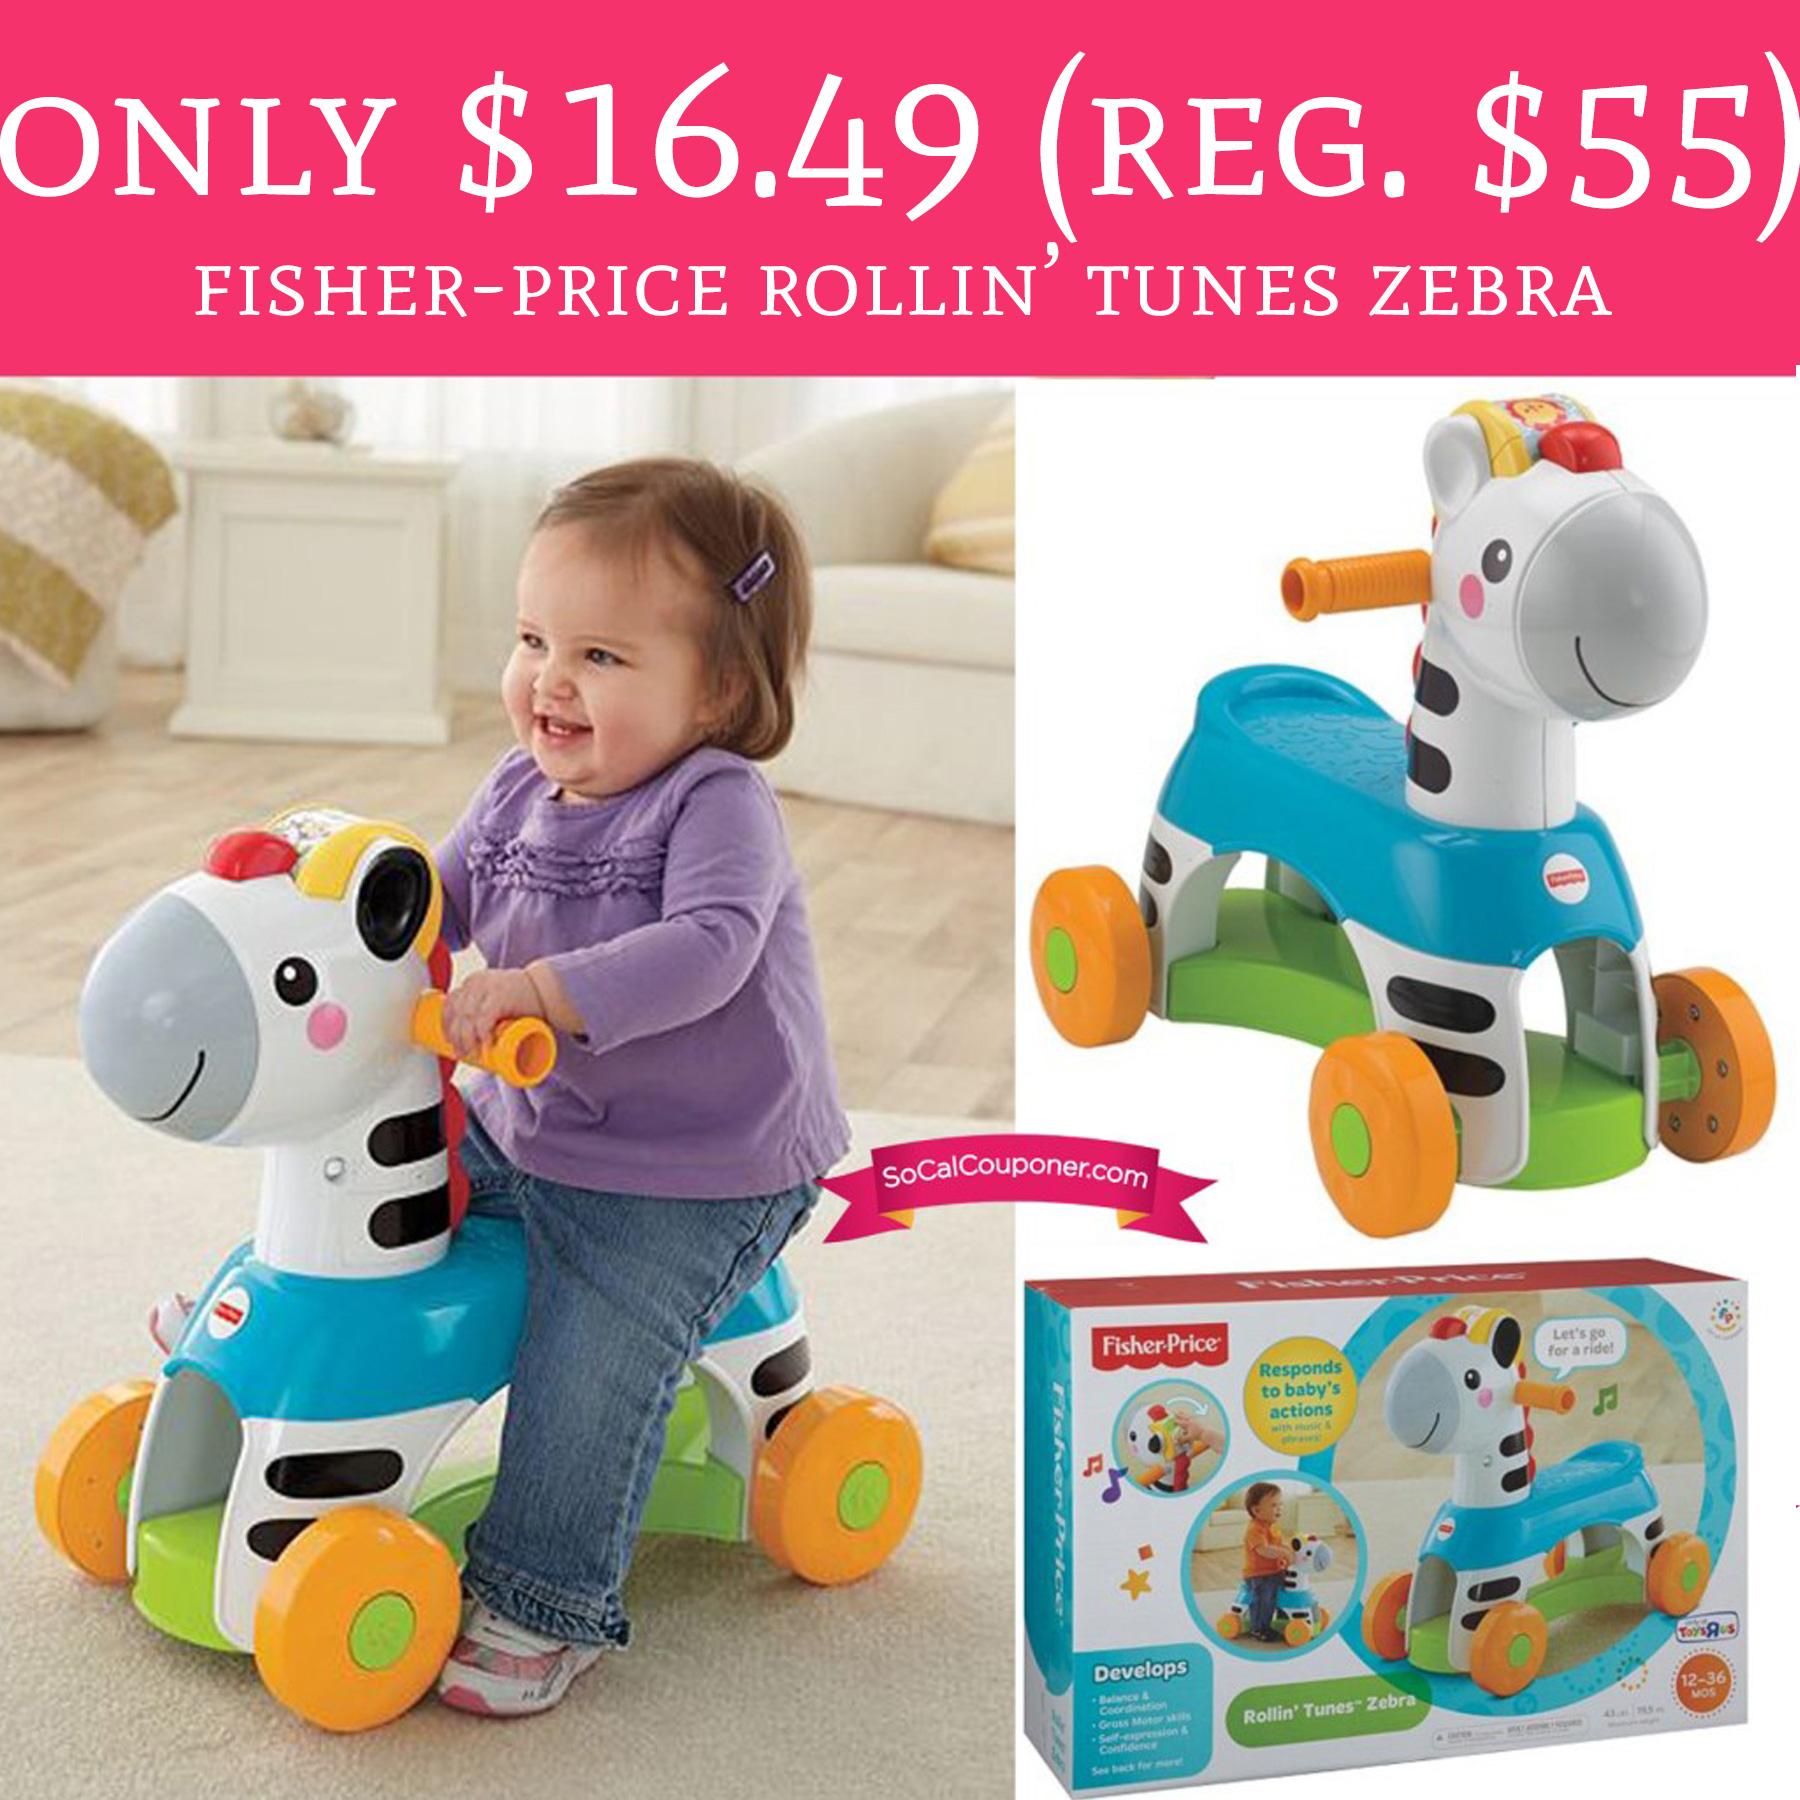 Run Only 16 49 Regular 55 Fisher Price Rollin Tunes